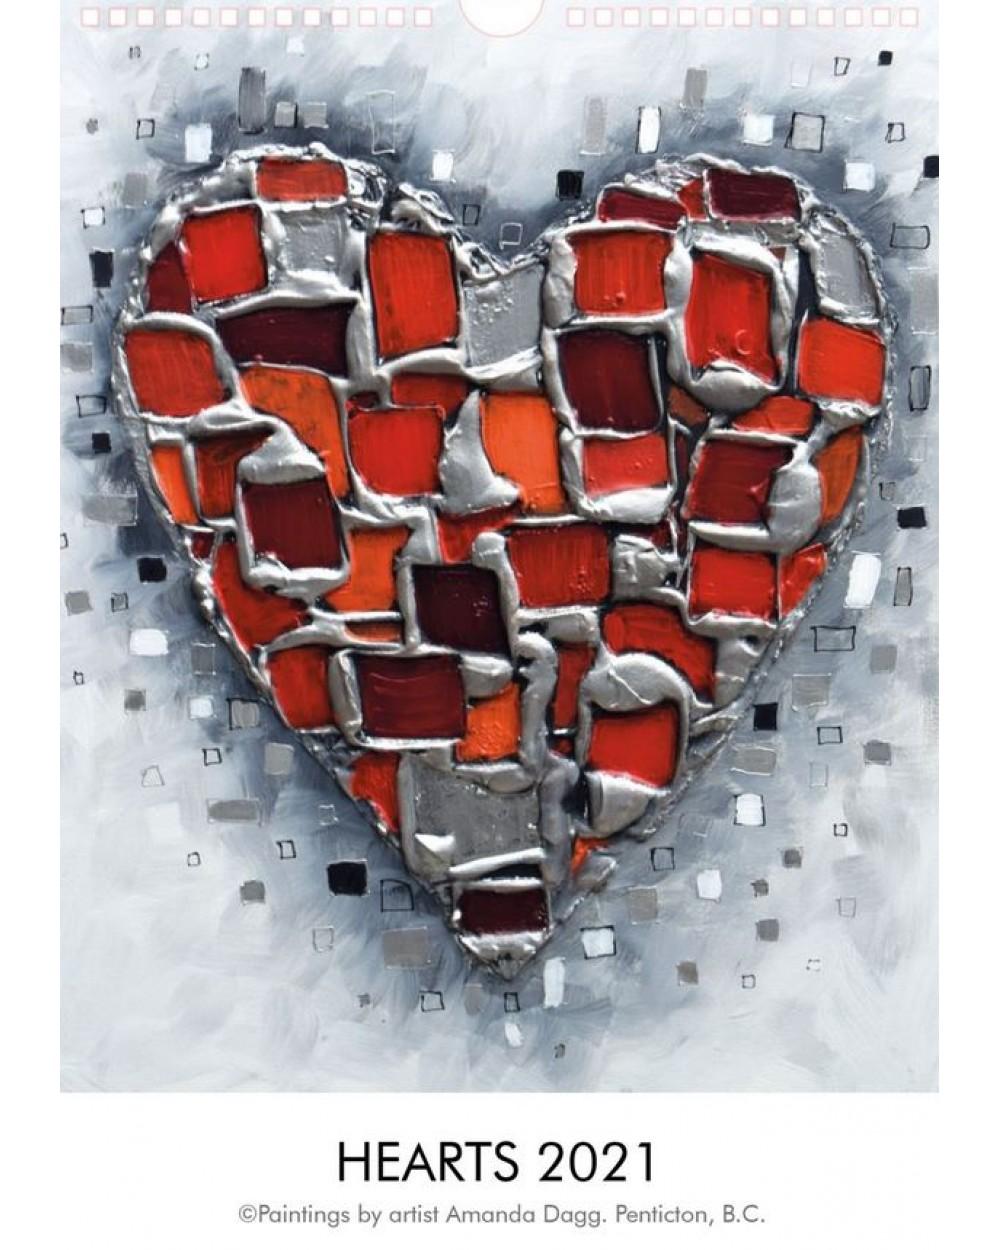 2021 Calendar of Hearts